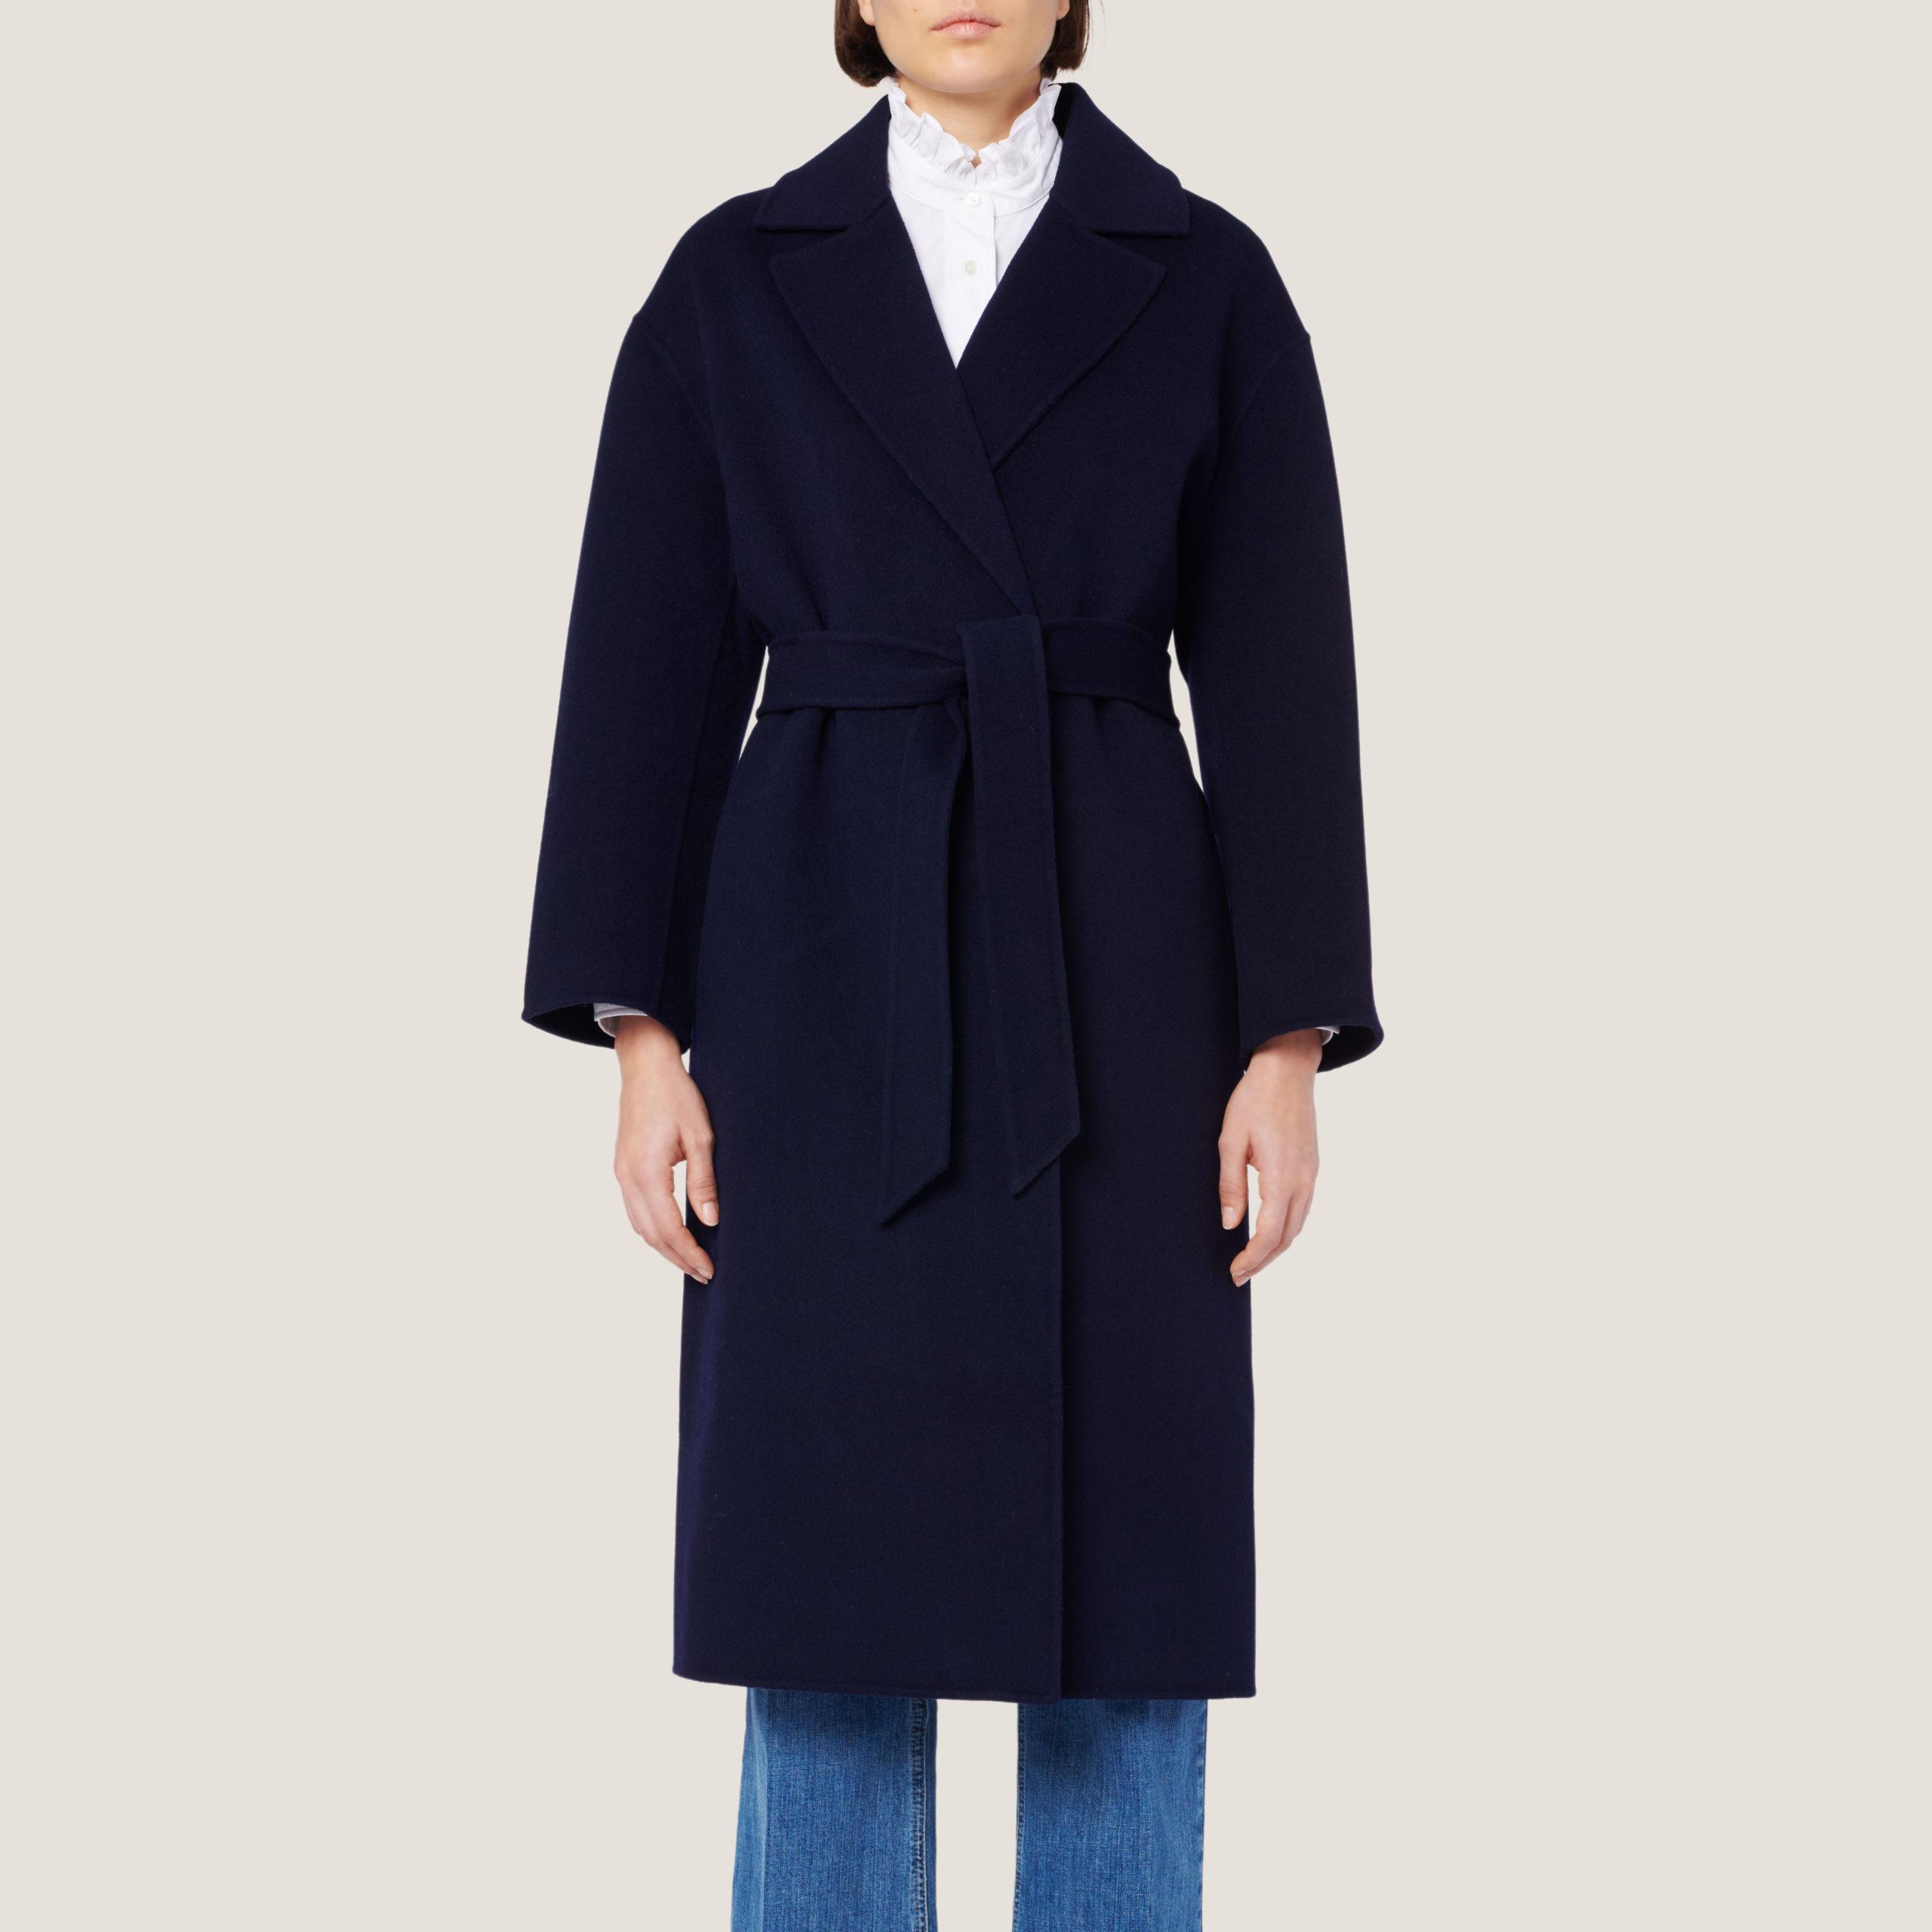 Sven Robe Coat